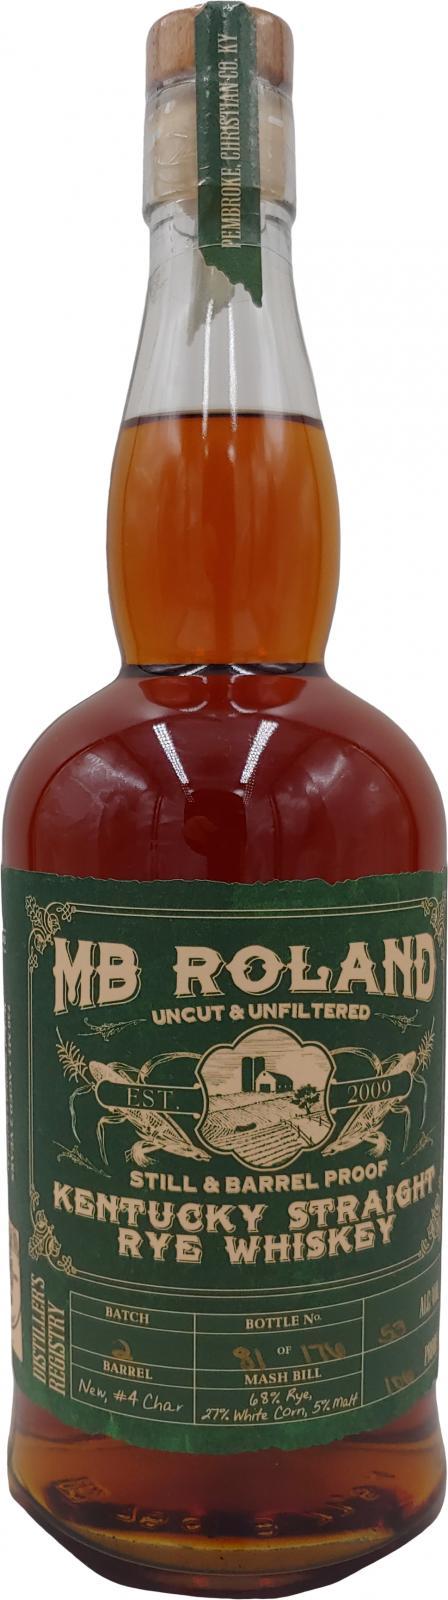 MB Roland Kentucky Straight Rye Whiskey